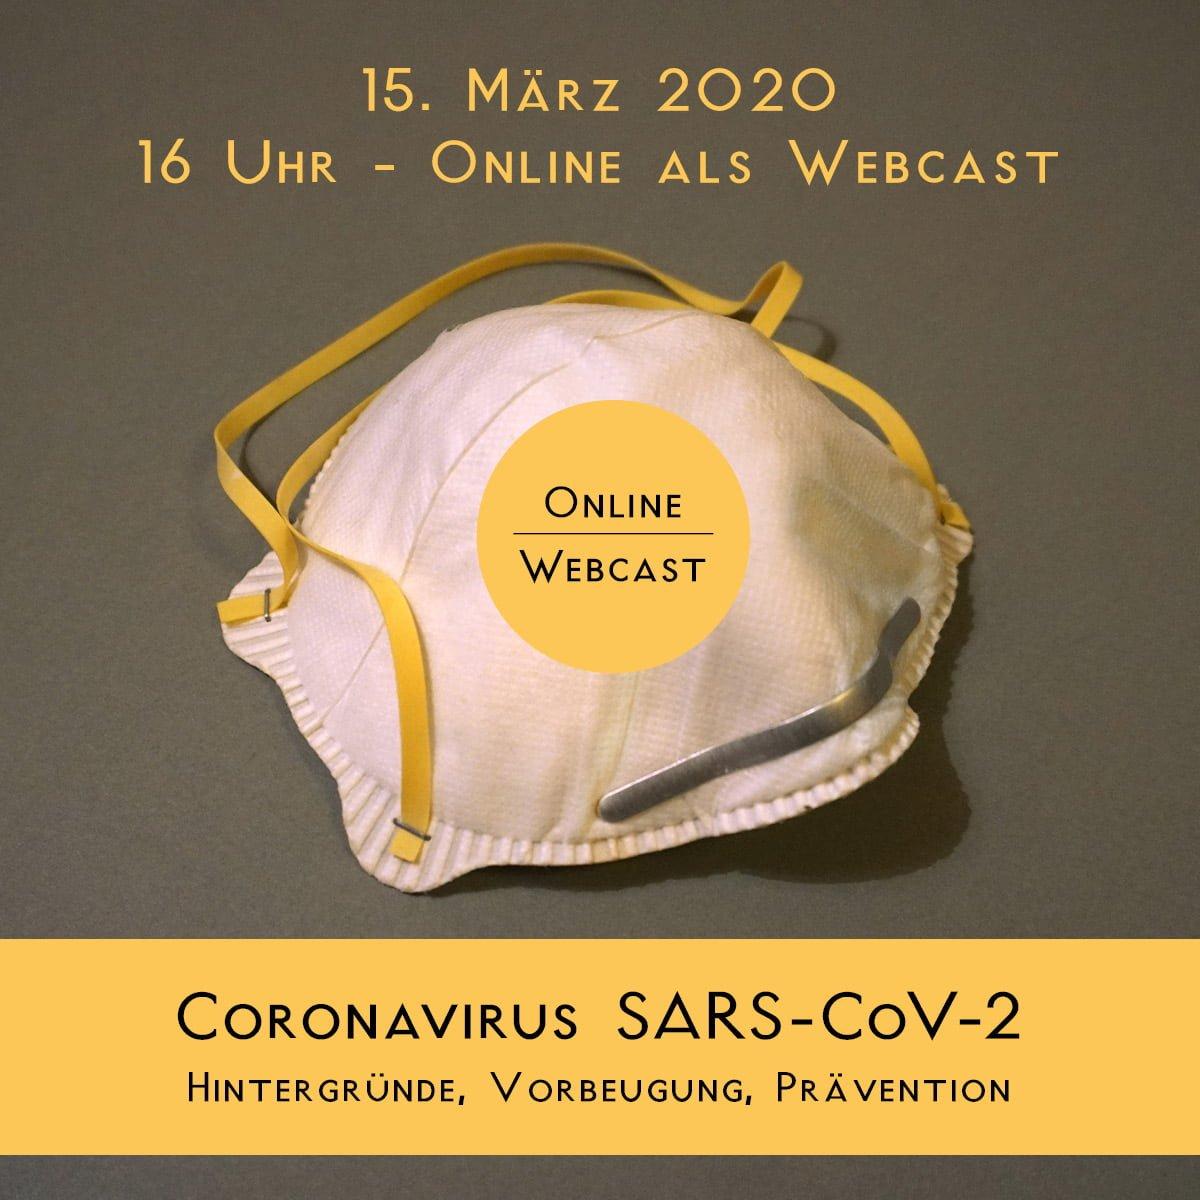 Webcast: Coronavirus SARS-CoV-2: Hintergründe, Vorbeugung, Behandlung